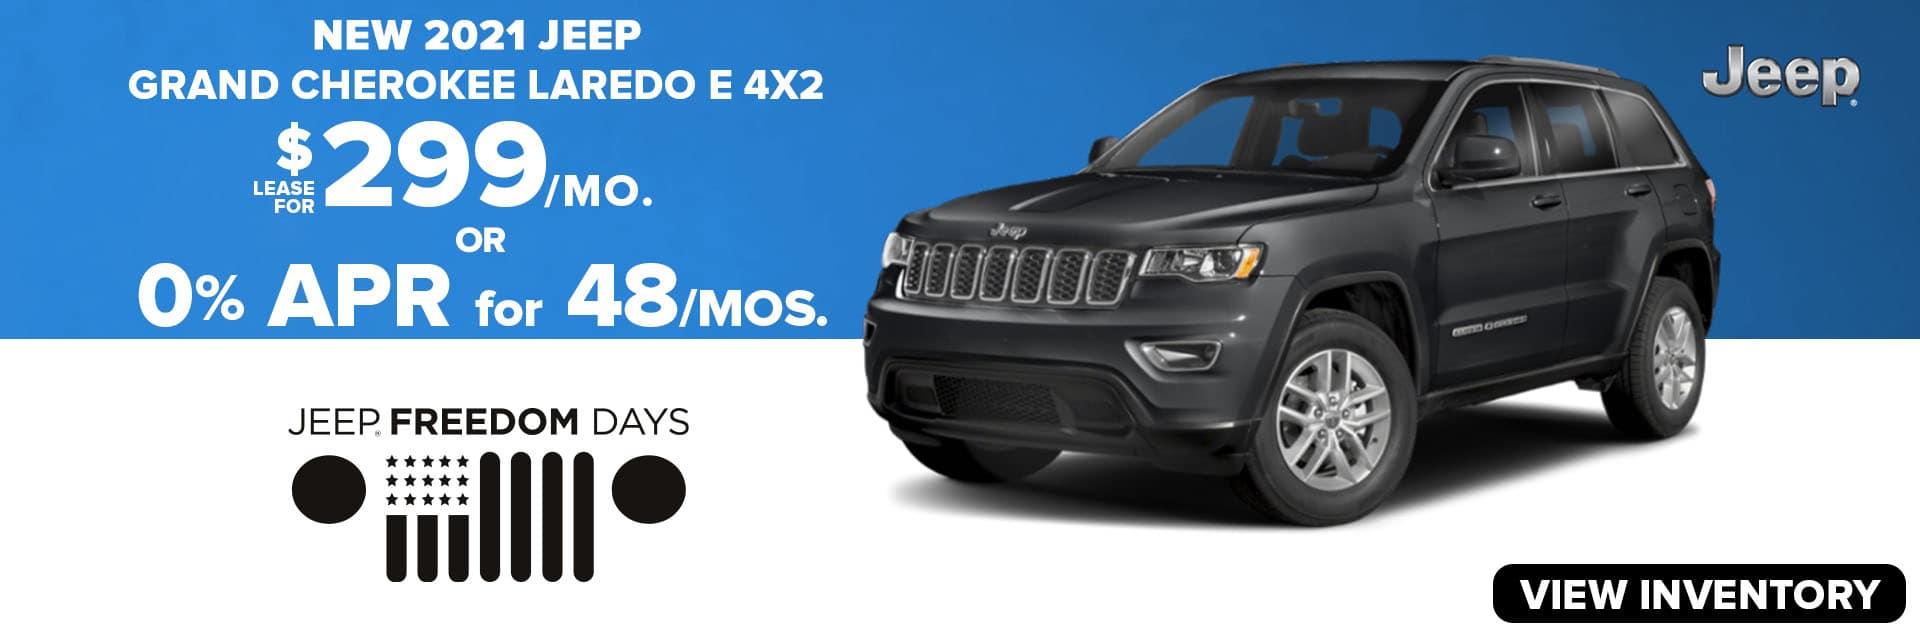 CLGO-June 2021-2021 Jeep Grand Cherokee copy